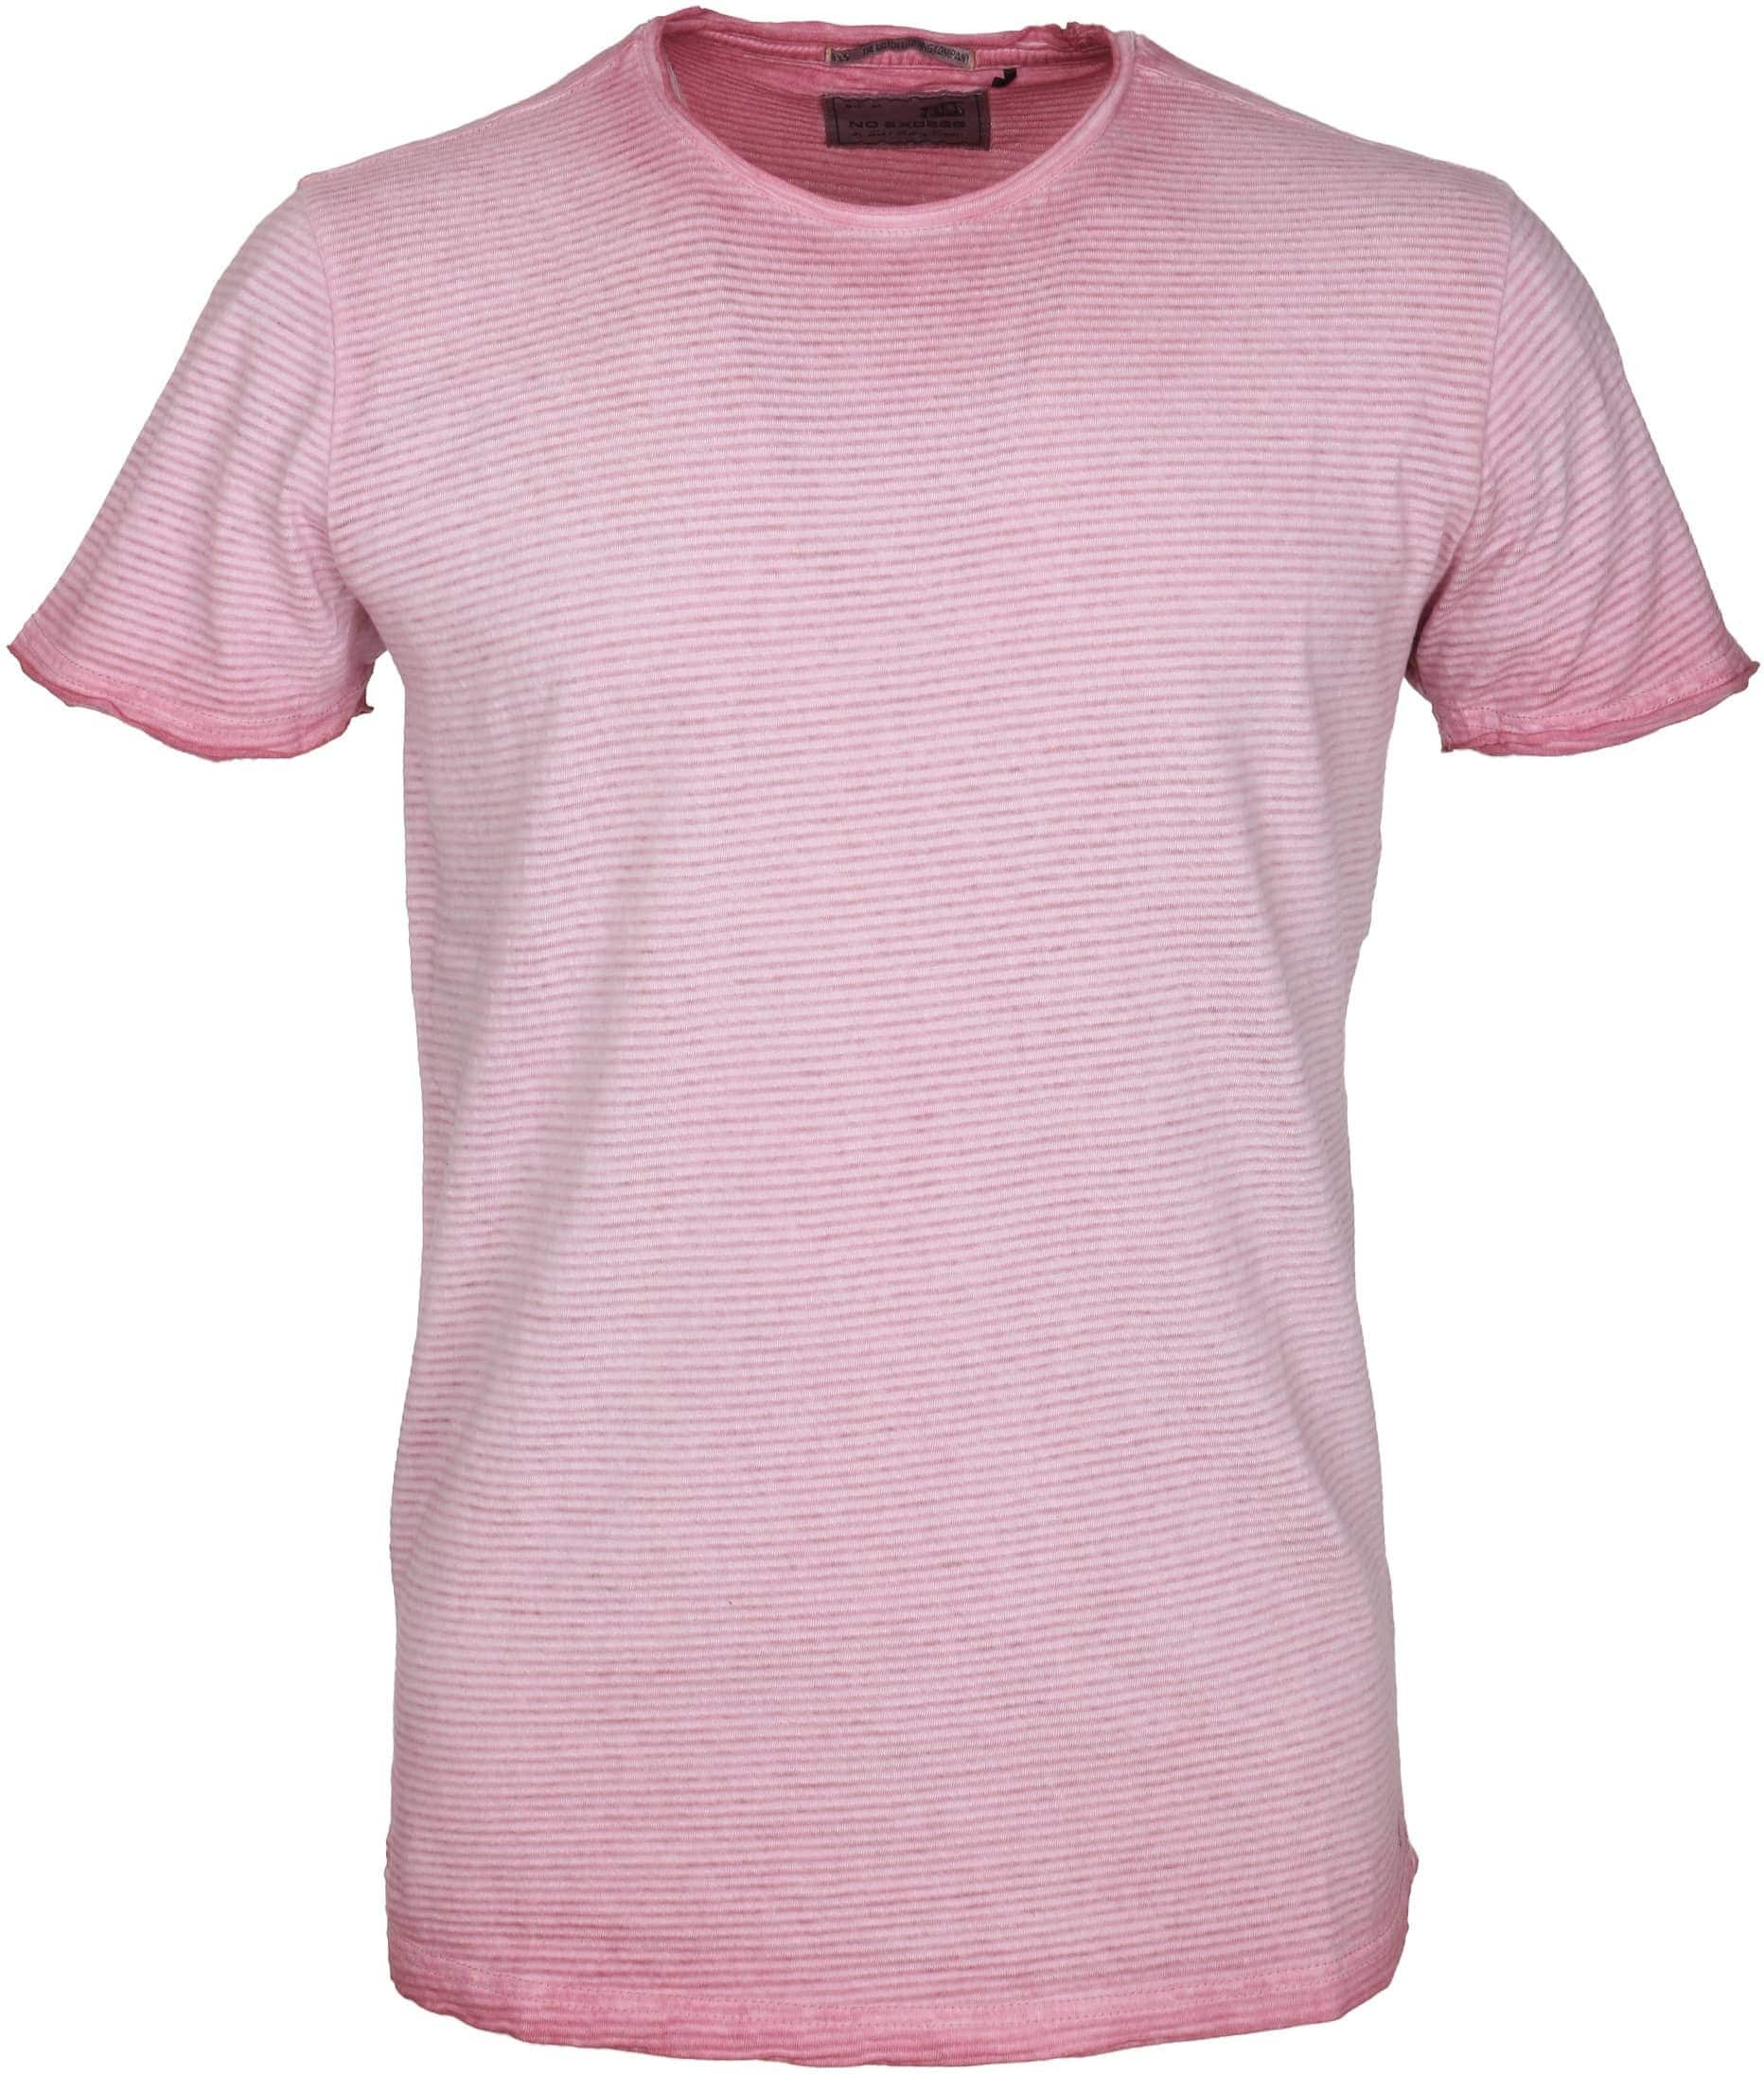 No-Excess T-shirt Roze Streep foto 0